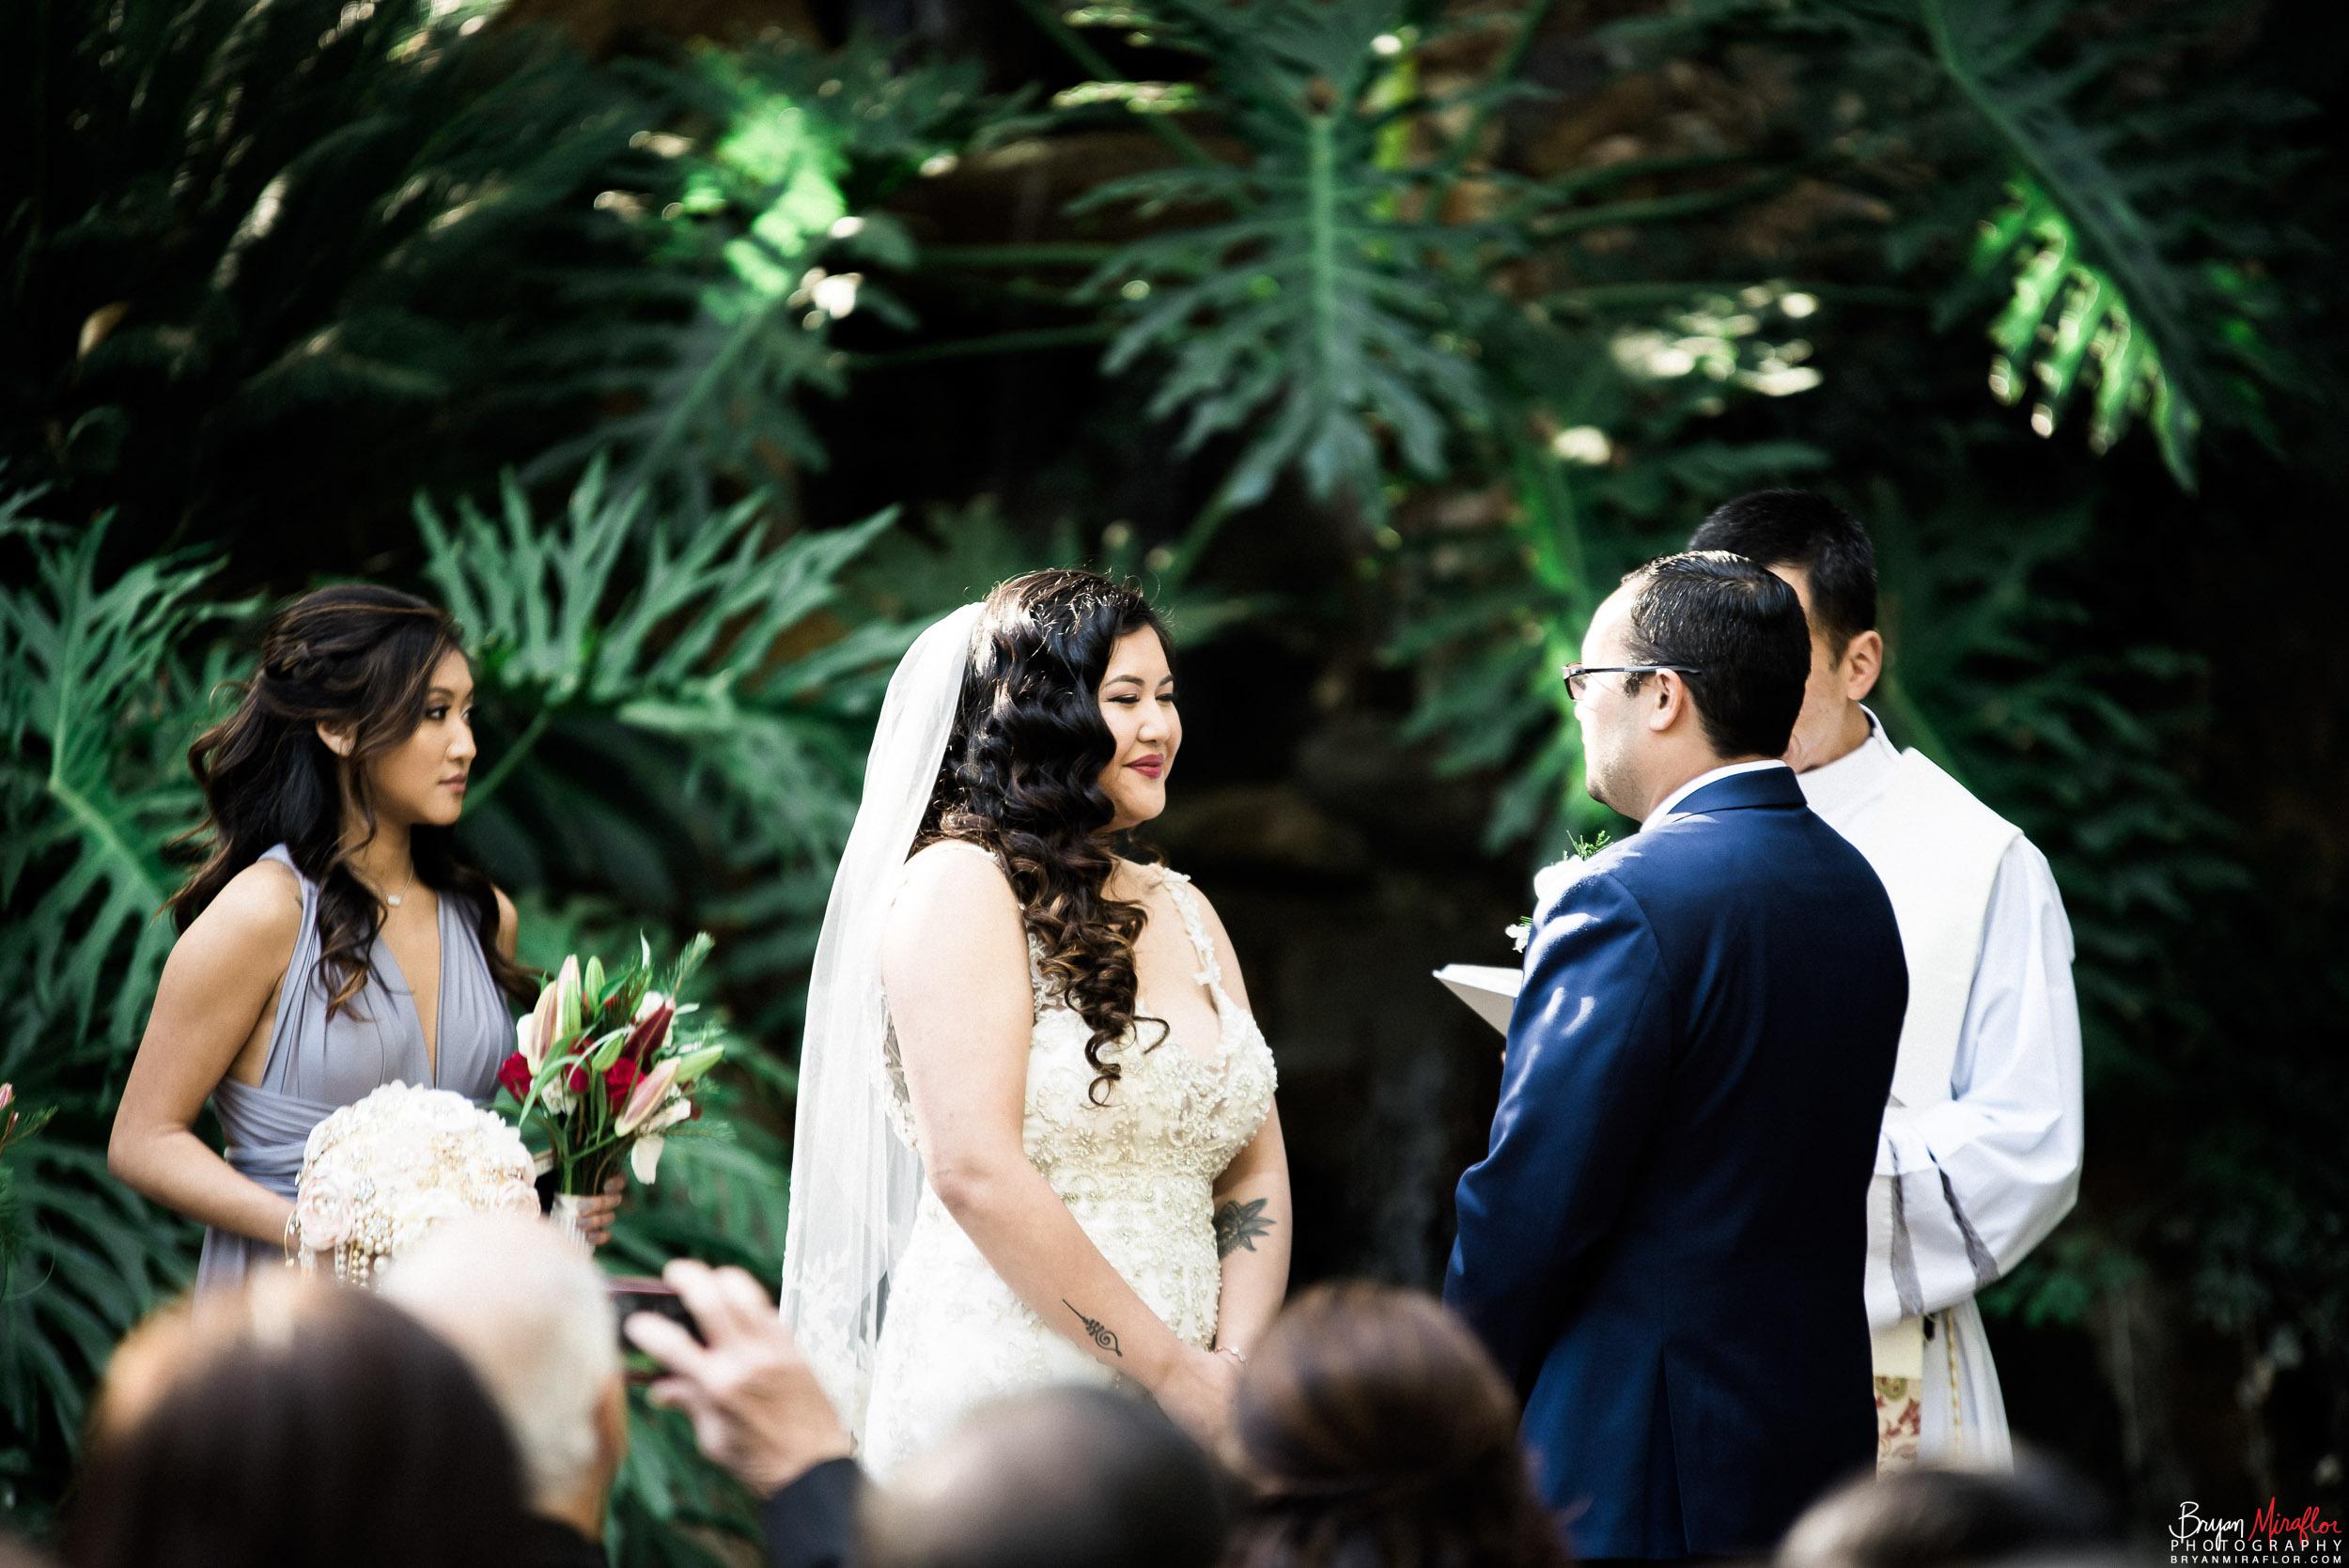 Bryan-Miraflor-Photography-Hannah-Jonathan-Married-Grand-Traditions-Estate-Gardens-Fallbrook-20171222-103.jpg